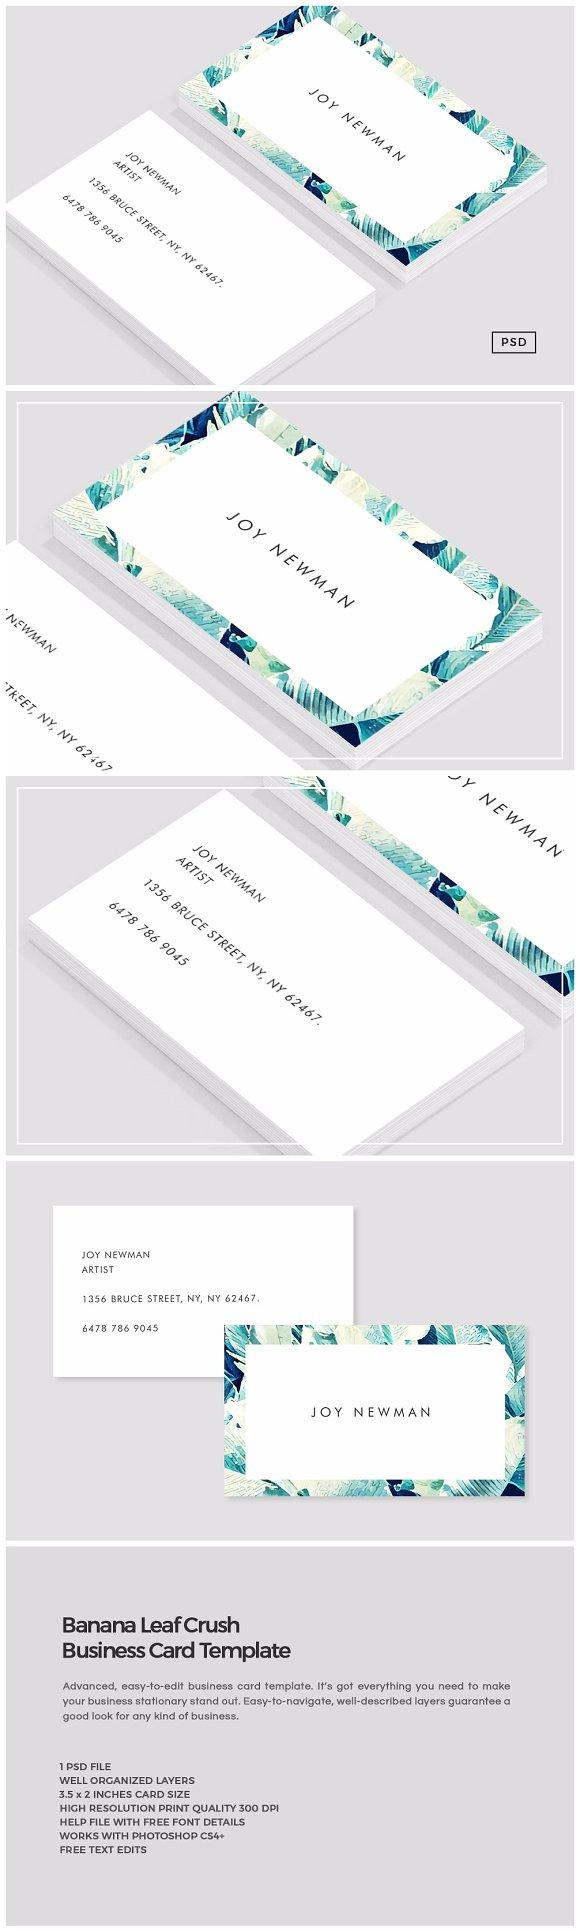 Banana Leaf Crush Business Card ~ Business Card Templates ...